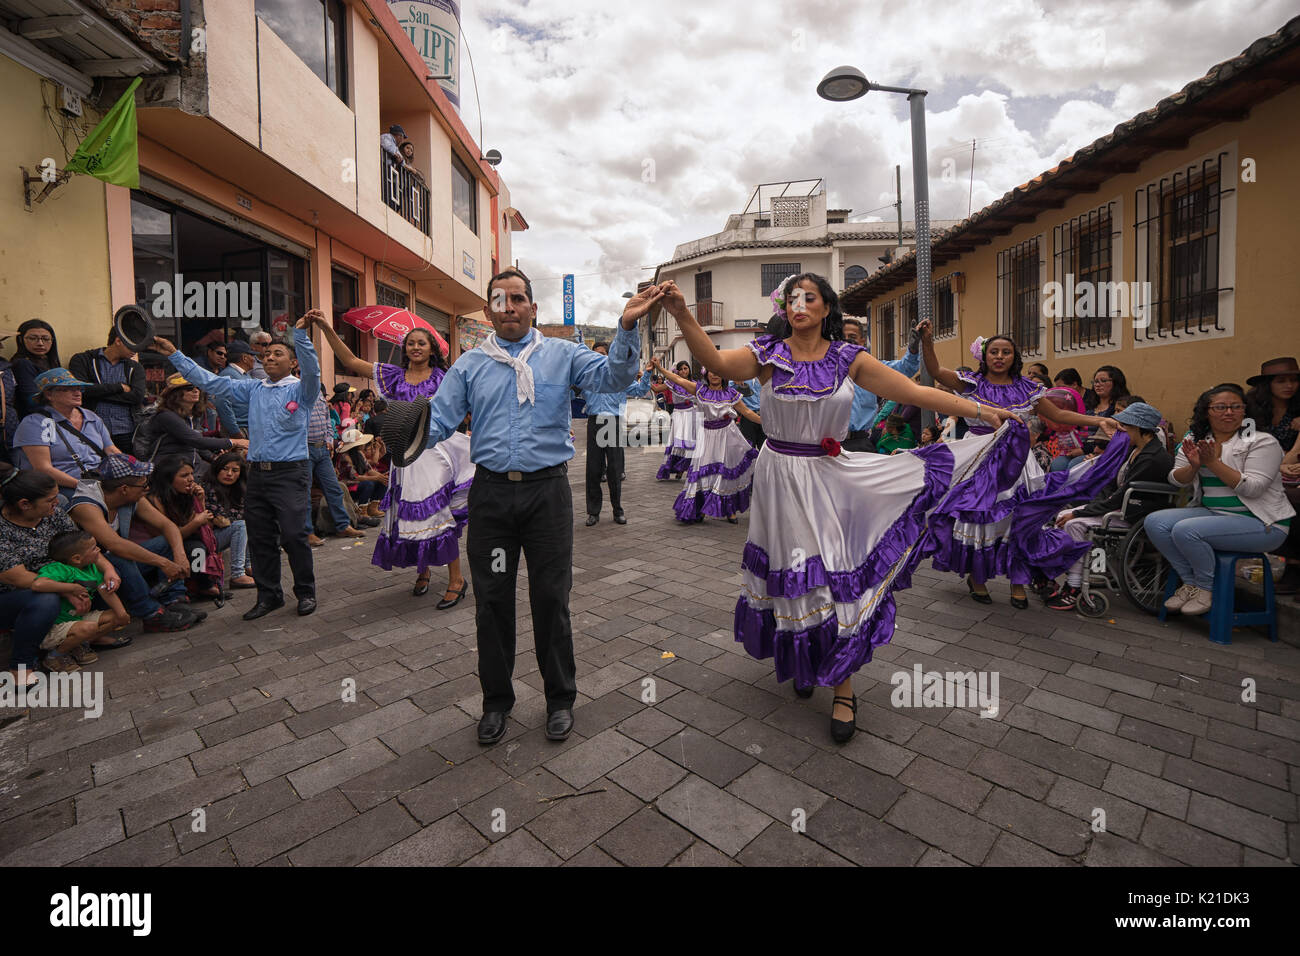 June 17, 2017 Pujili, Ecuador: street dancers performing in traditional clothing during Corpus Christi - Stock Image